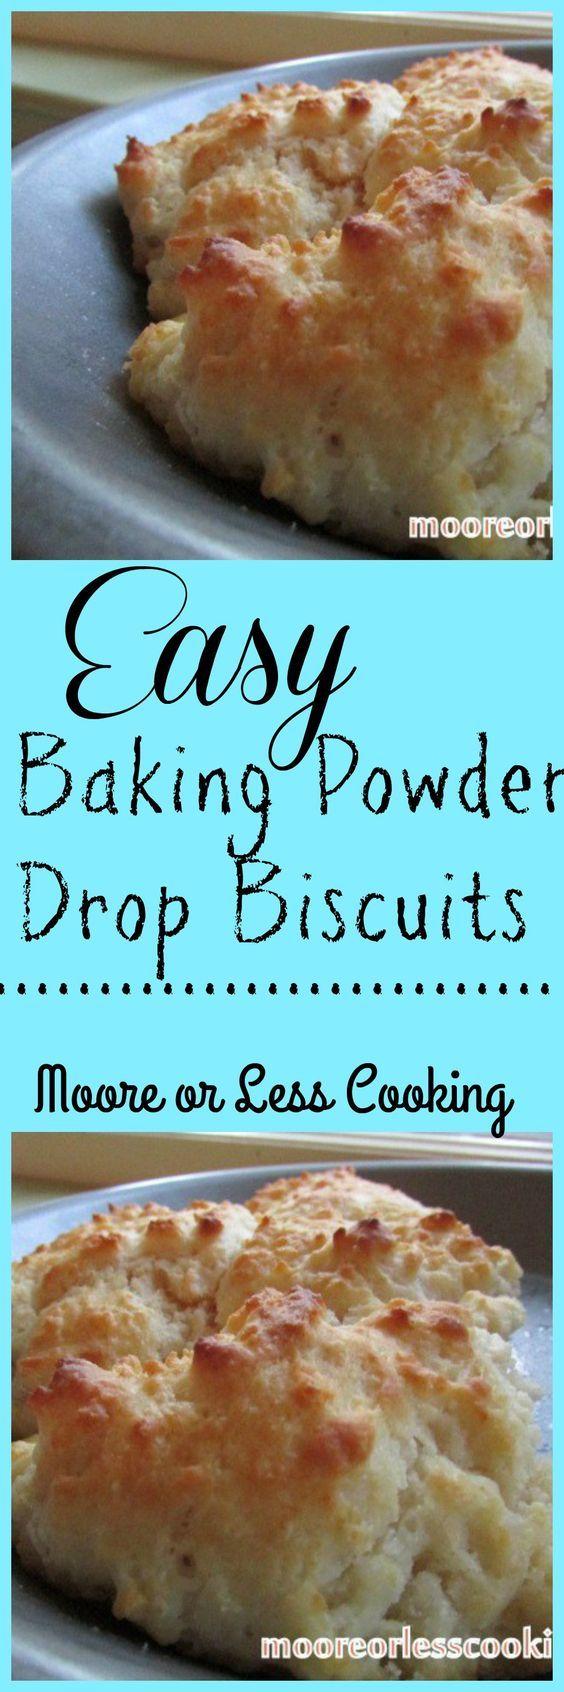 Baking Powder Drop Biscuits